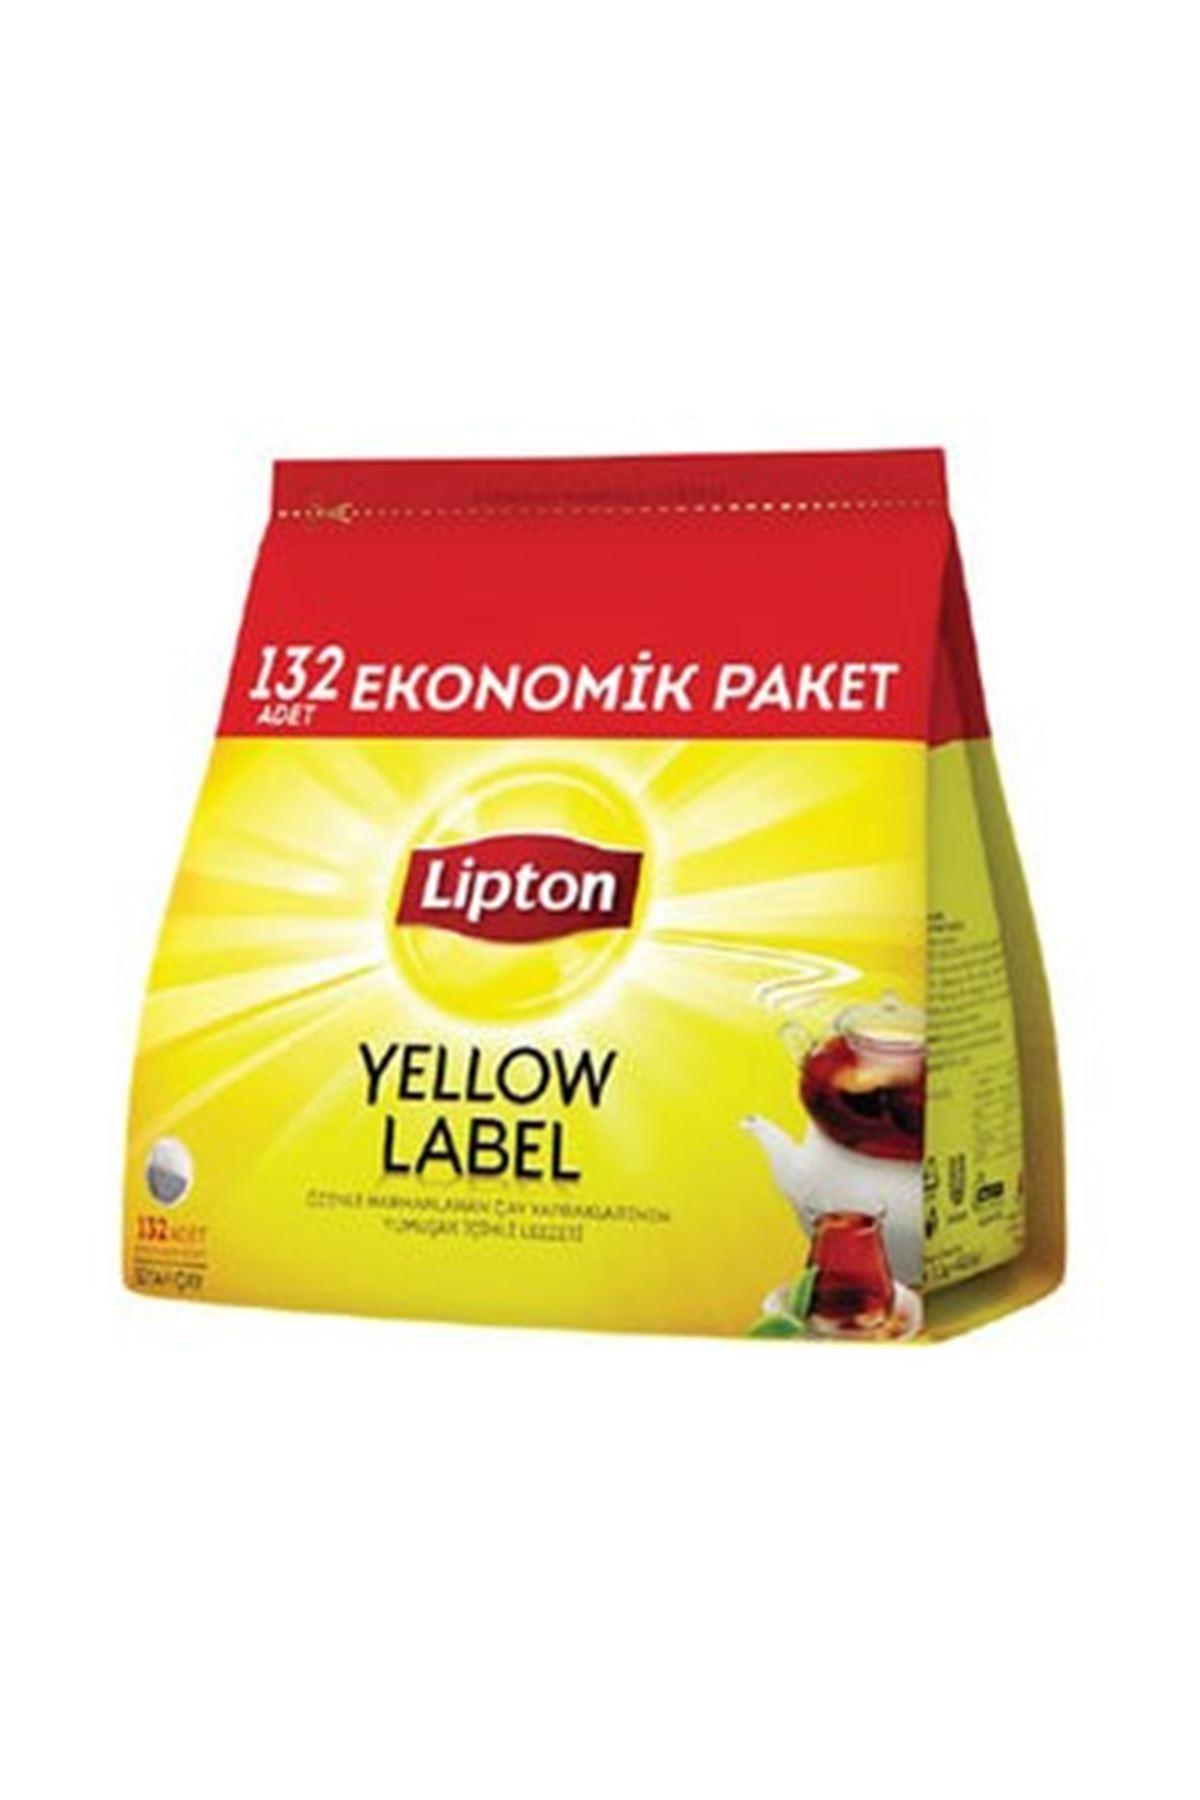 Lipton Demlik Poşet Çay Yellow Label 132'li